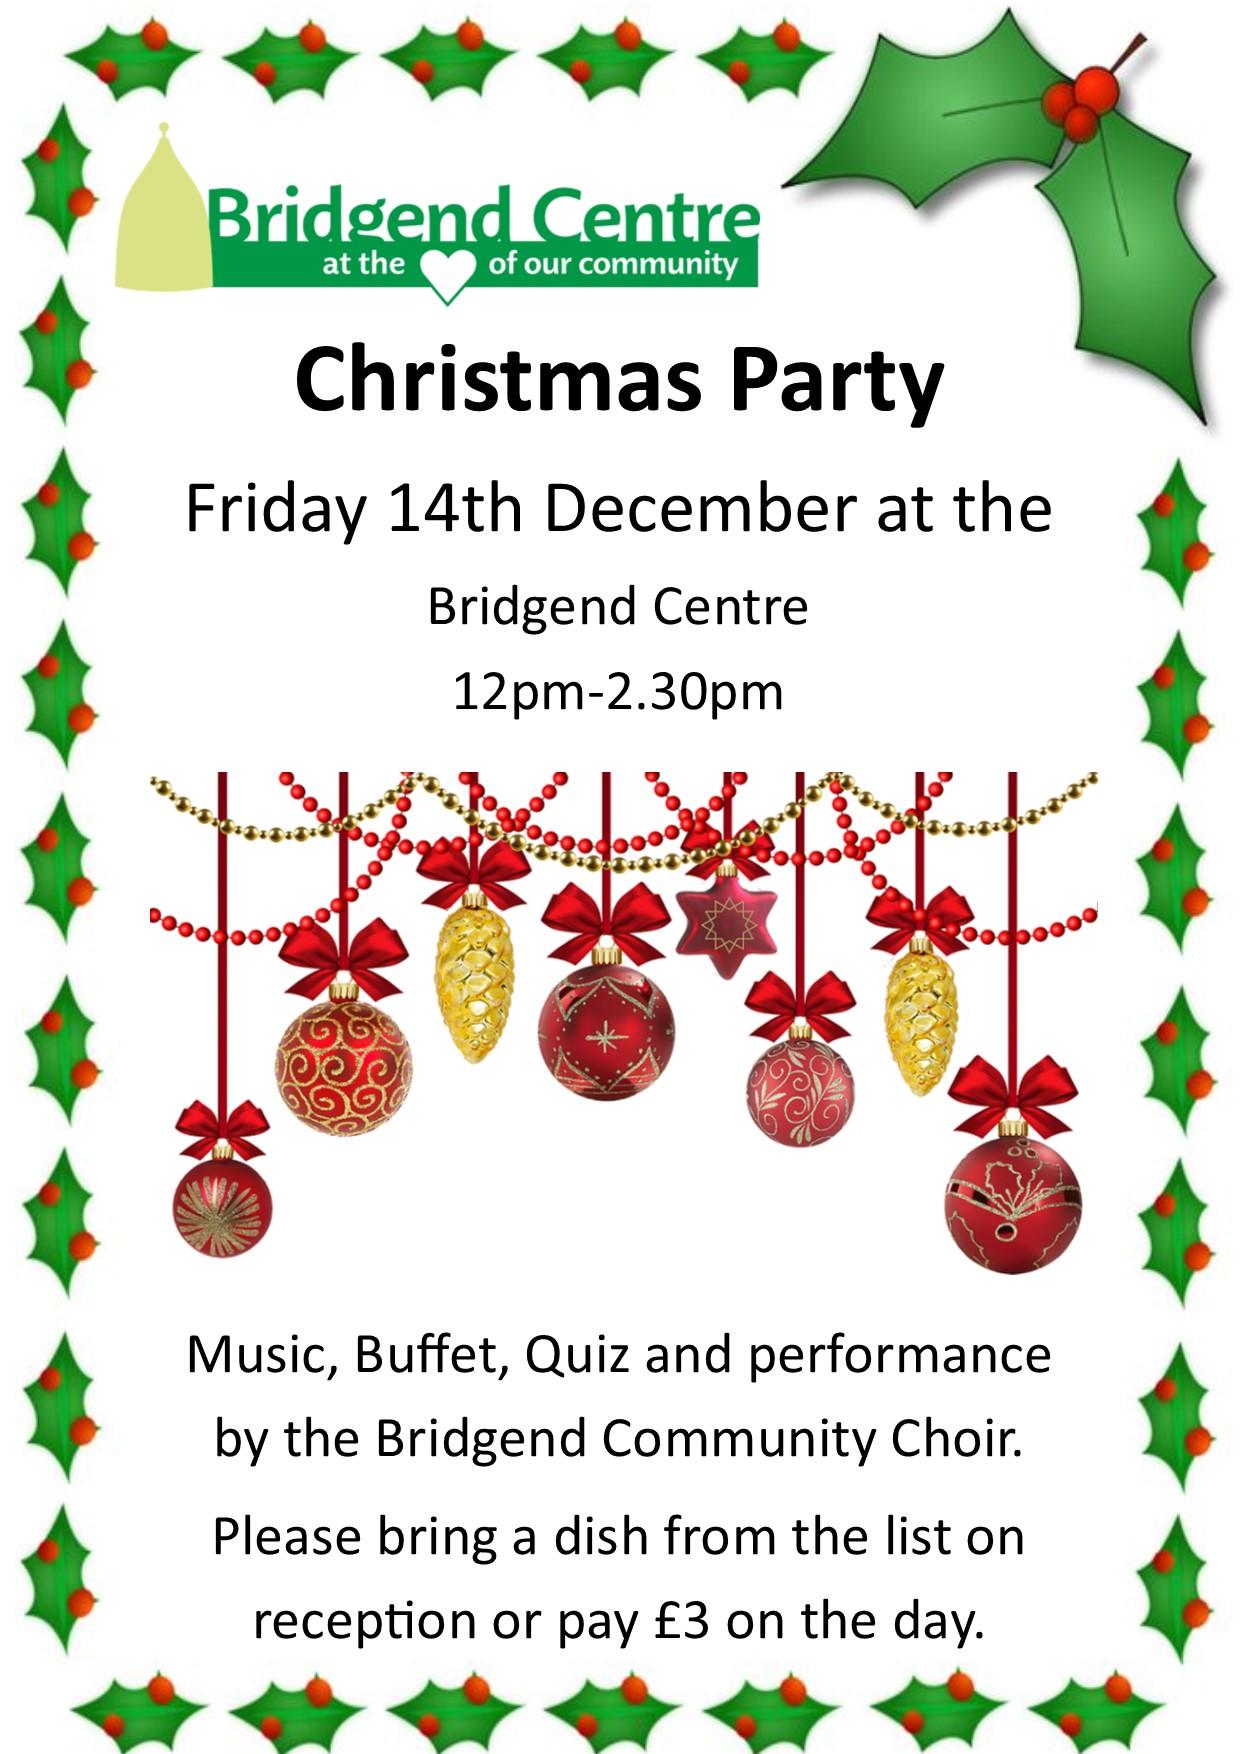 Christmas Party at The Bridgend Centre